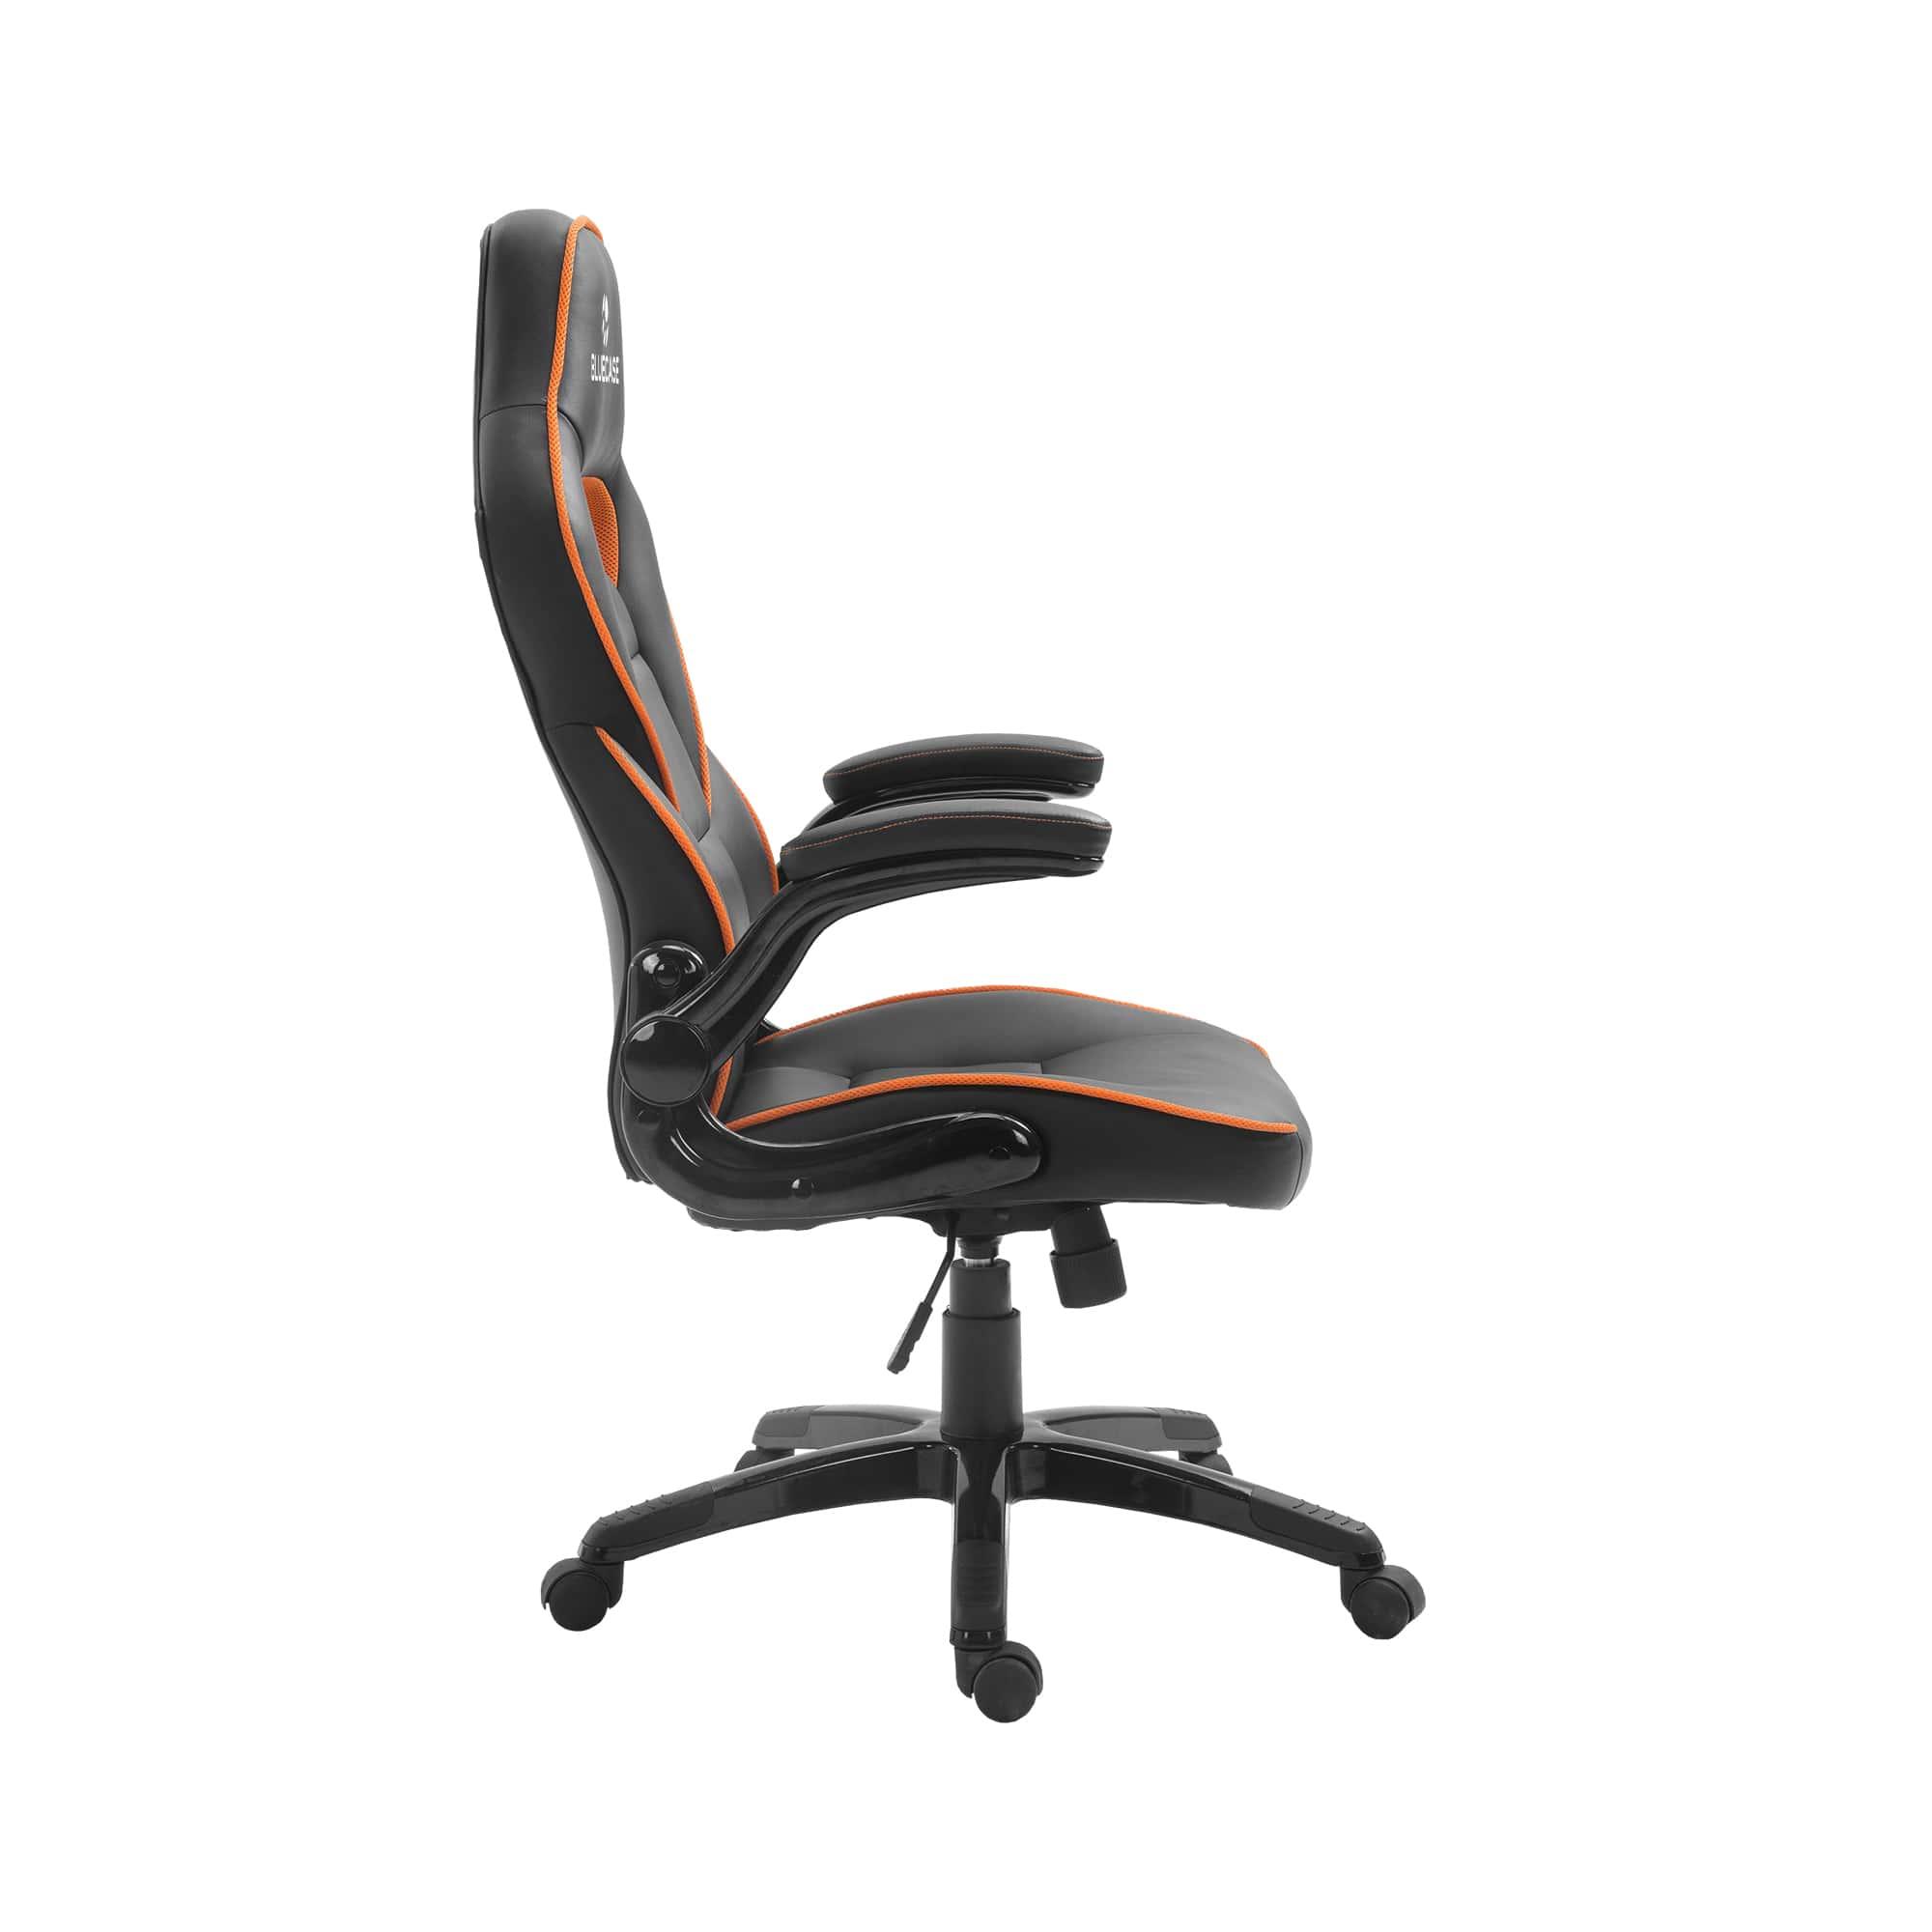 Cadeira Gamer Bluecase Mercury Laranja/Preto - BCH-41OBK